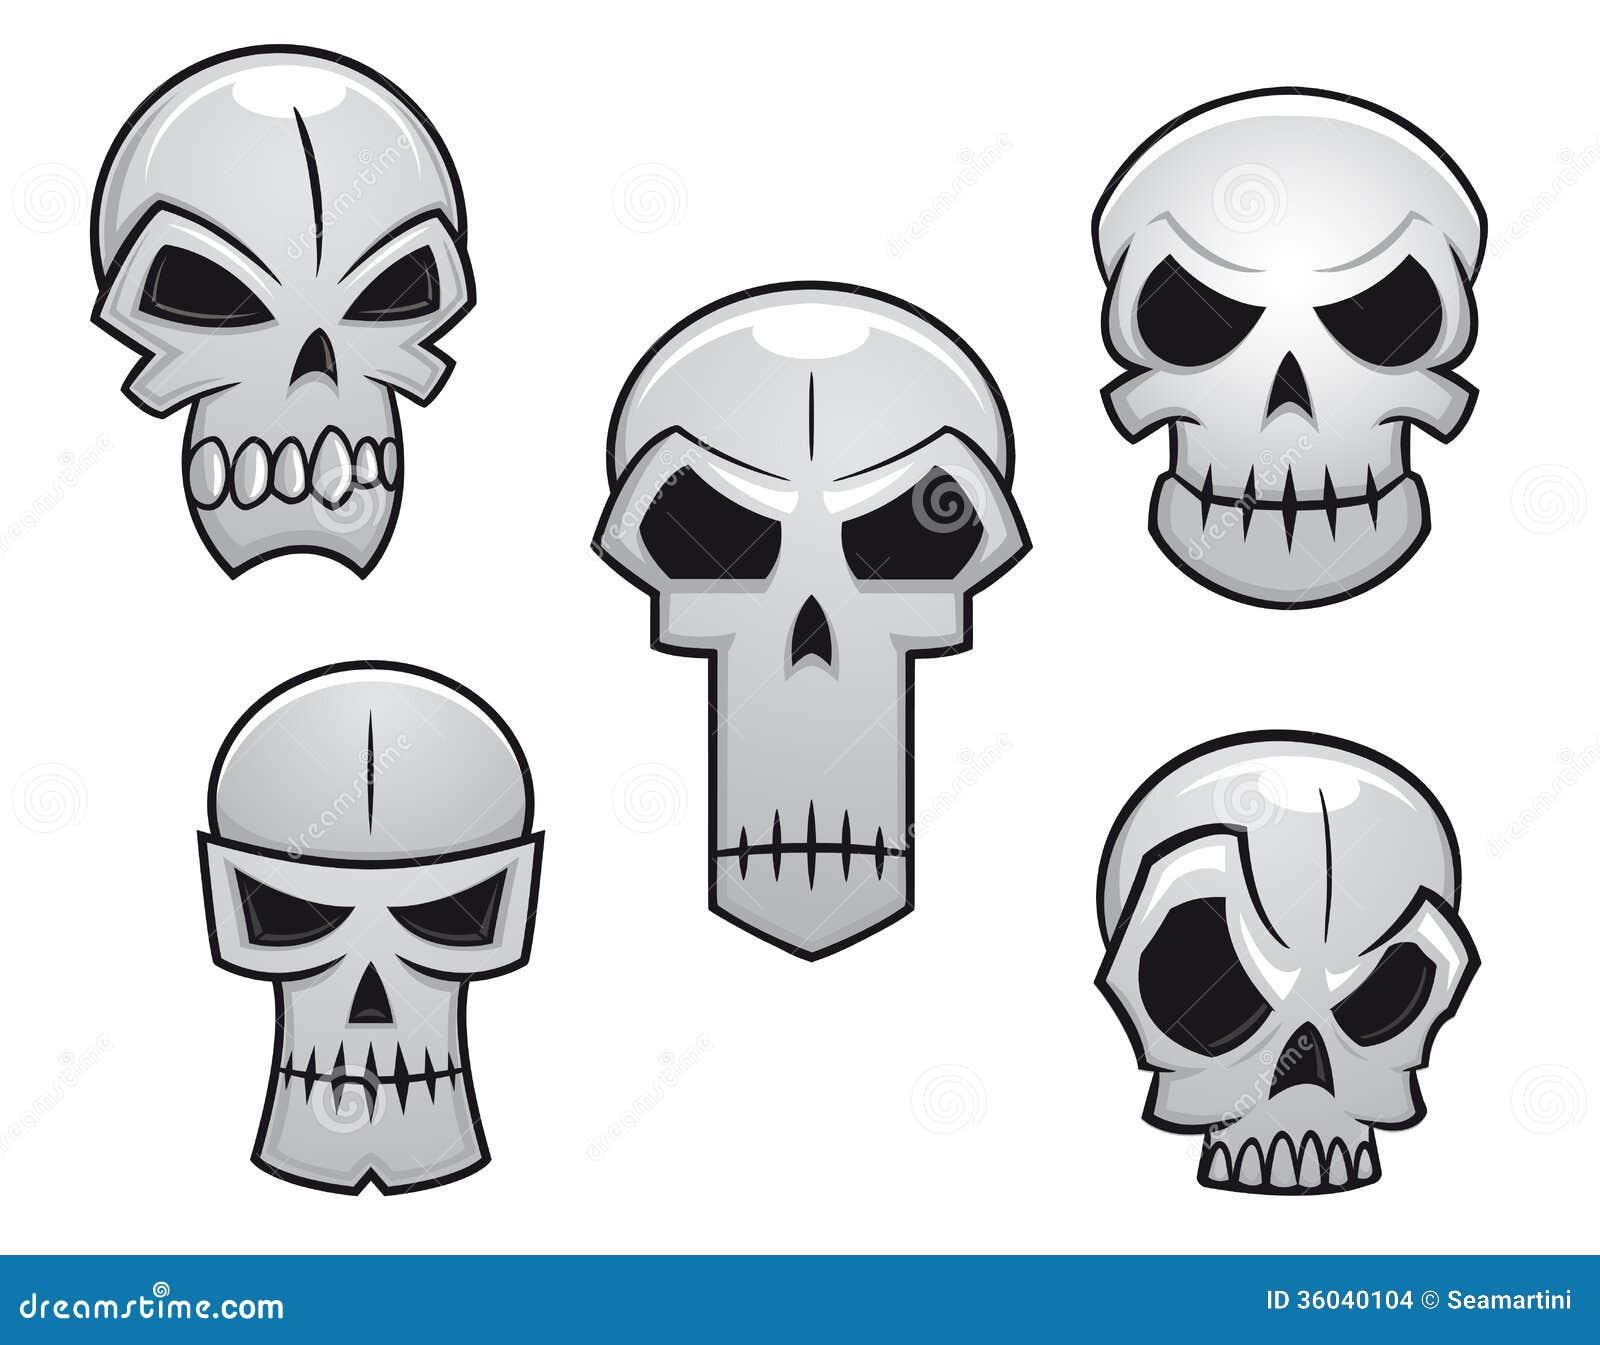 Cartoon Skulls Set With Danger Stock Images - Image: 36040104